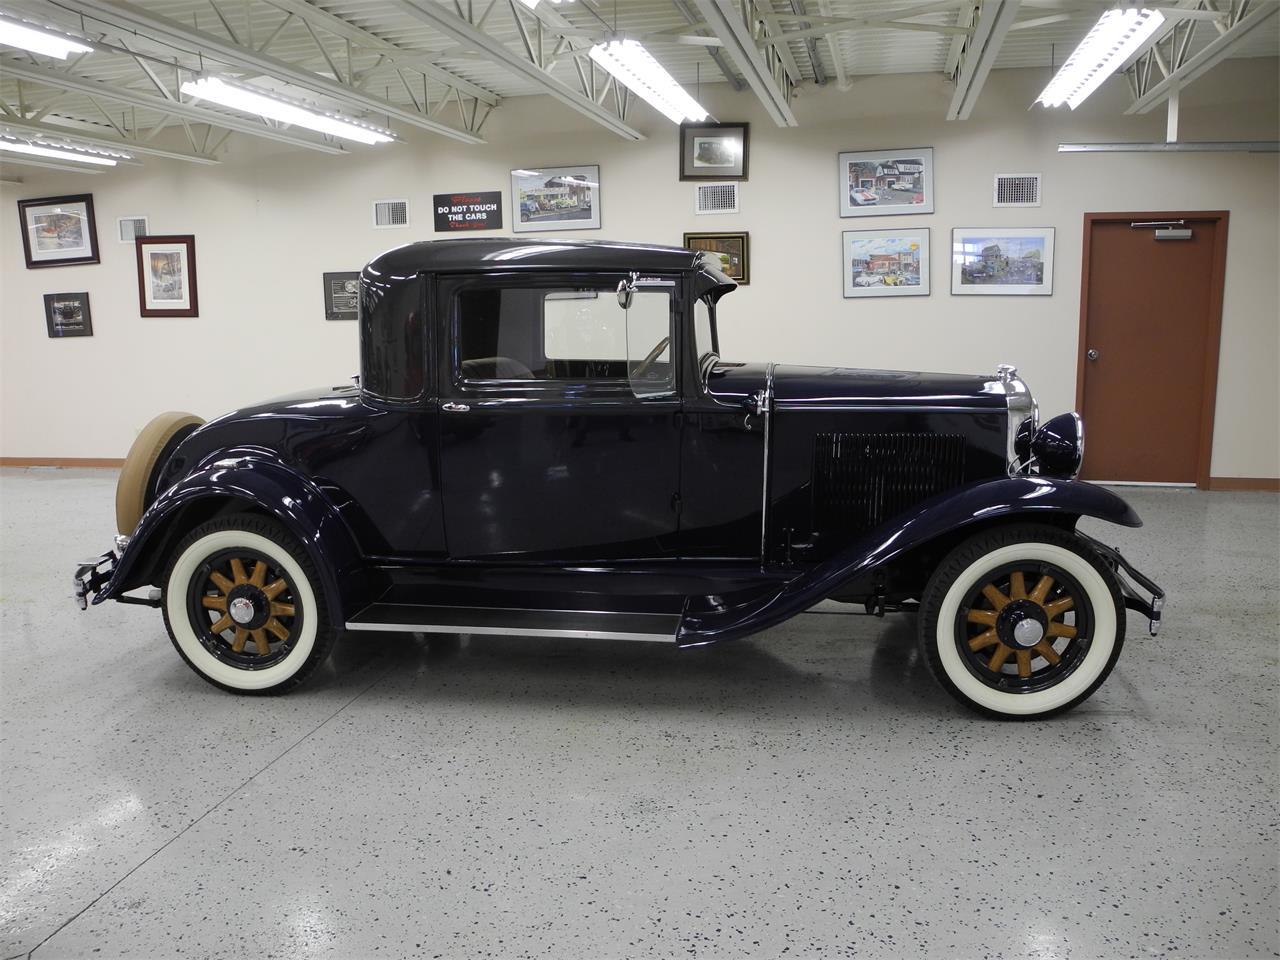 Sudbury Car Dealerships >> 1930 Buick Coupe for Sale | ClassicCars.com | CC-1039778